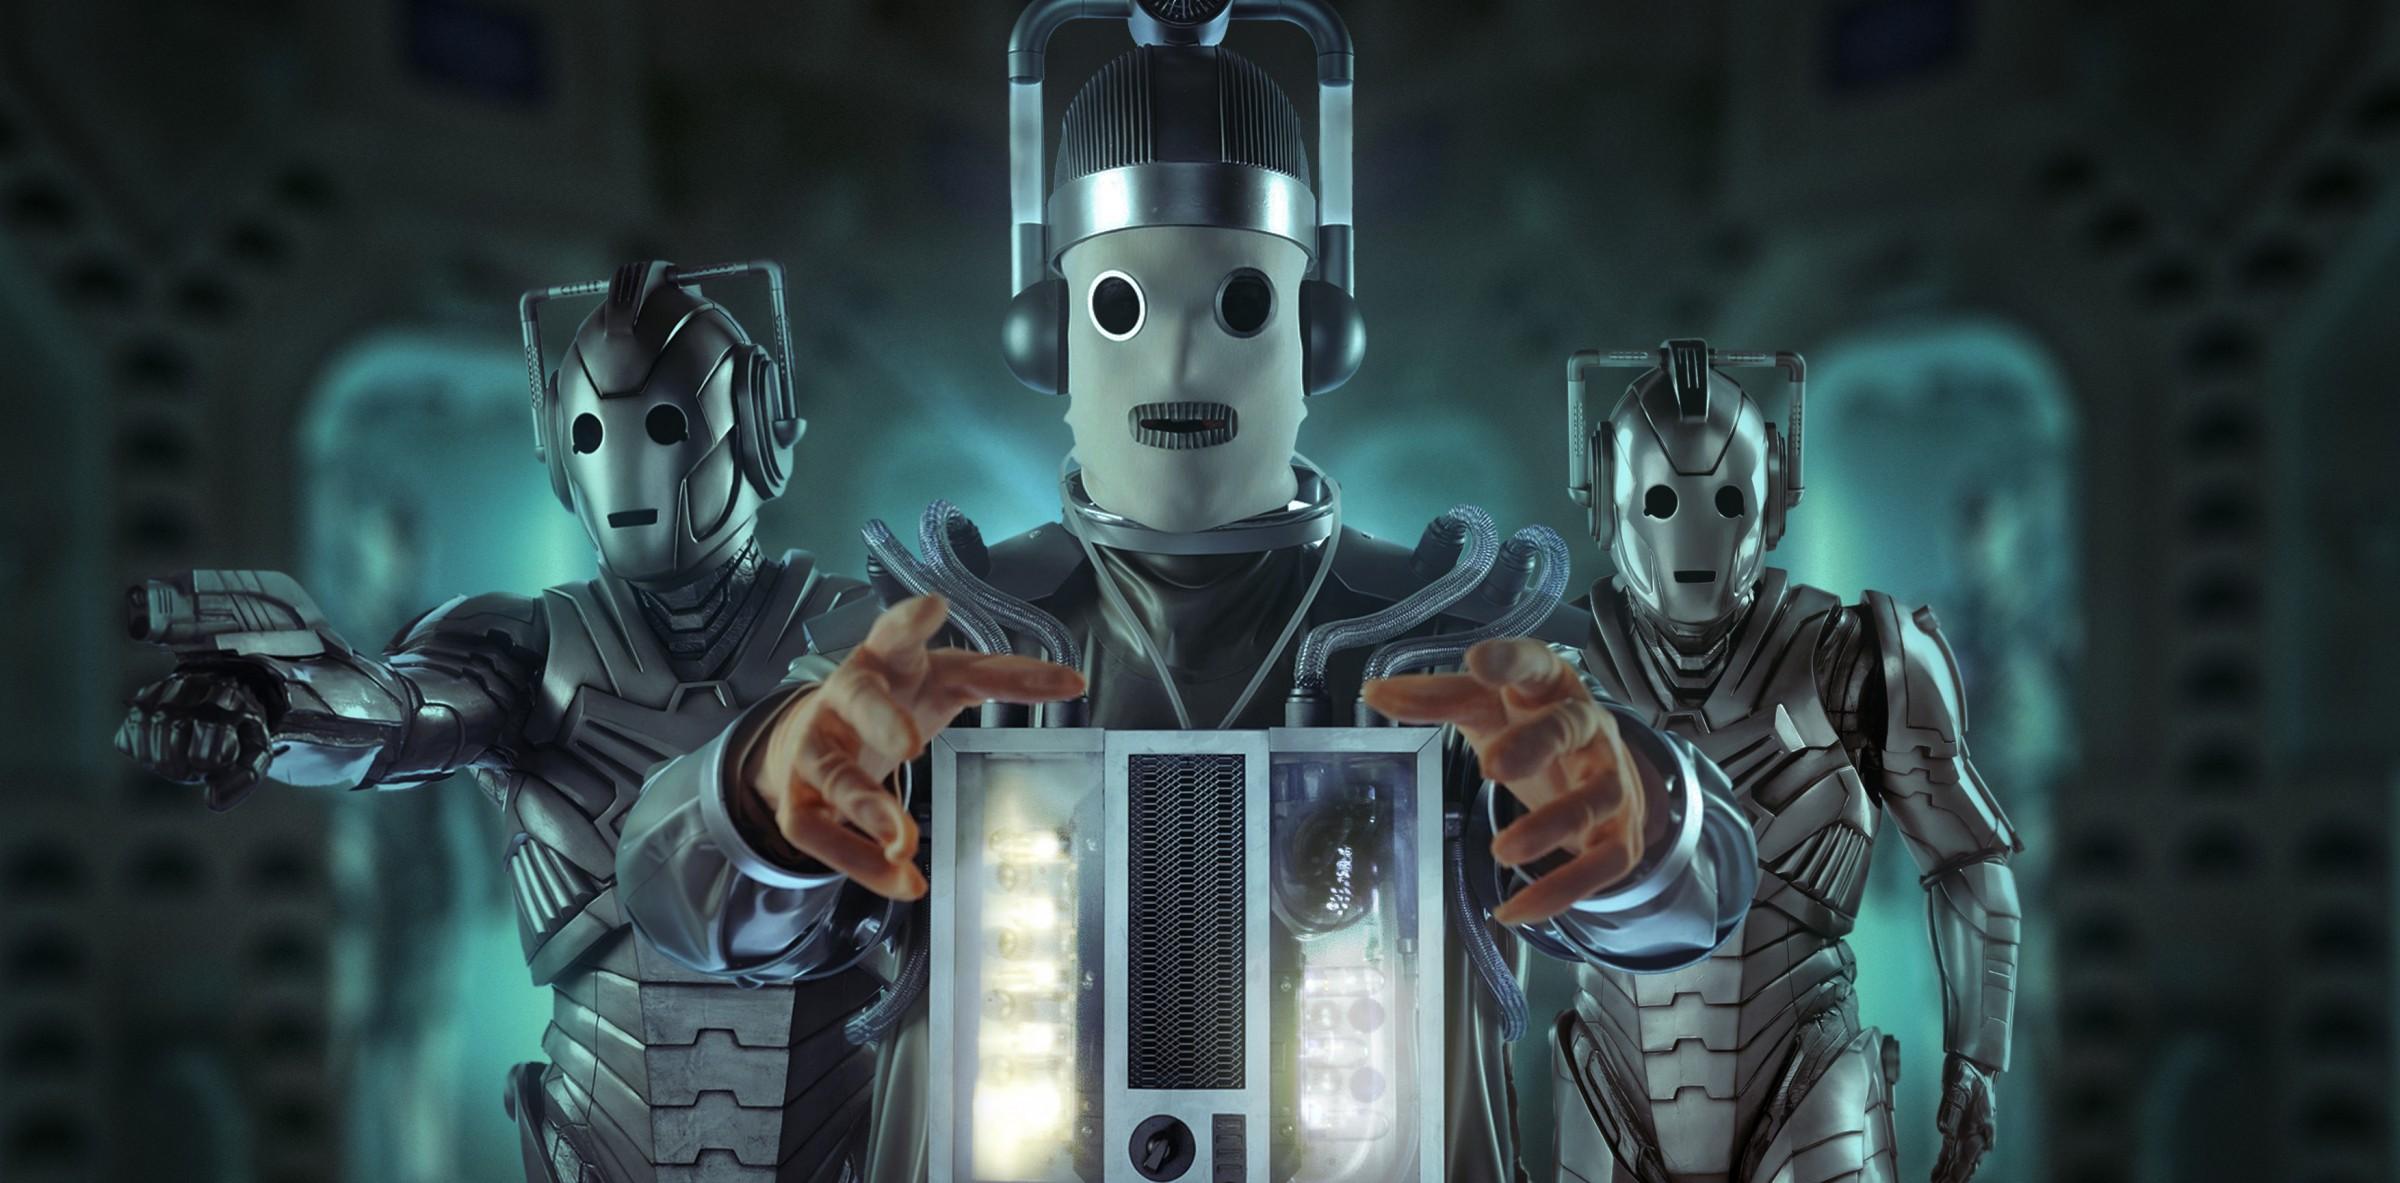 Cybermeni